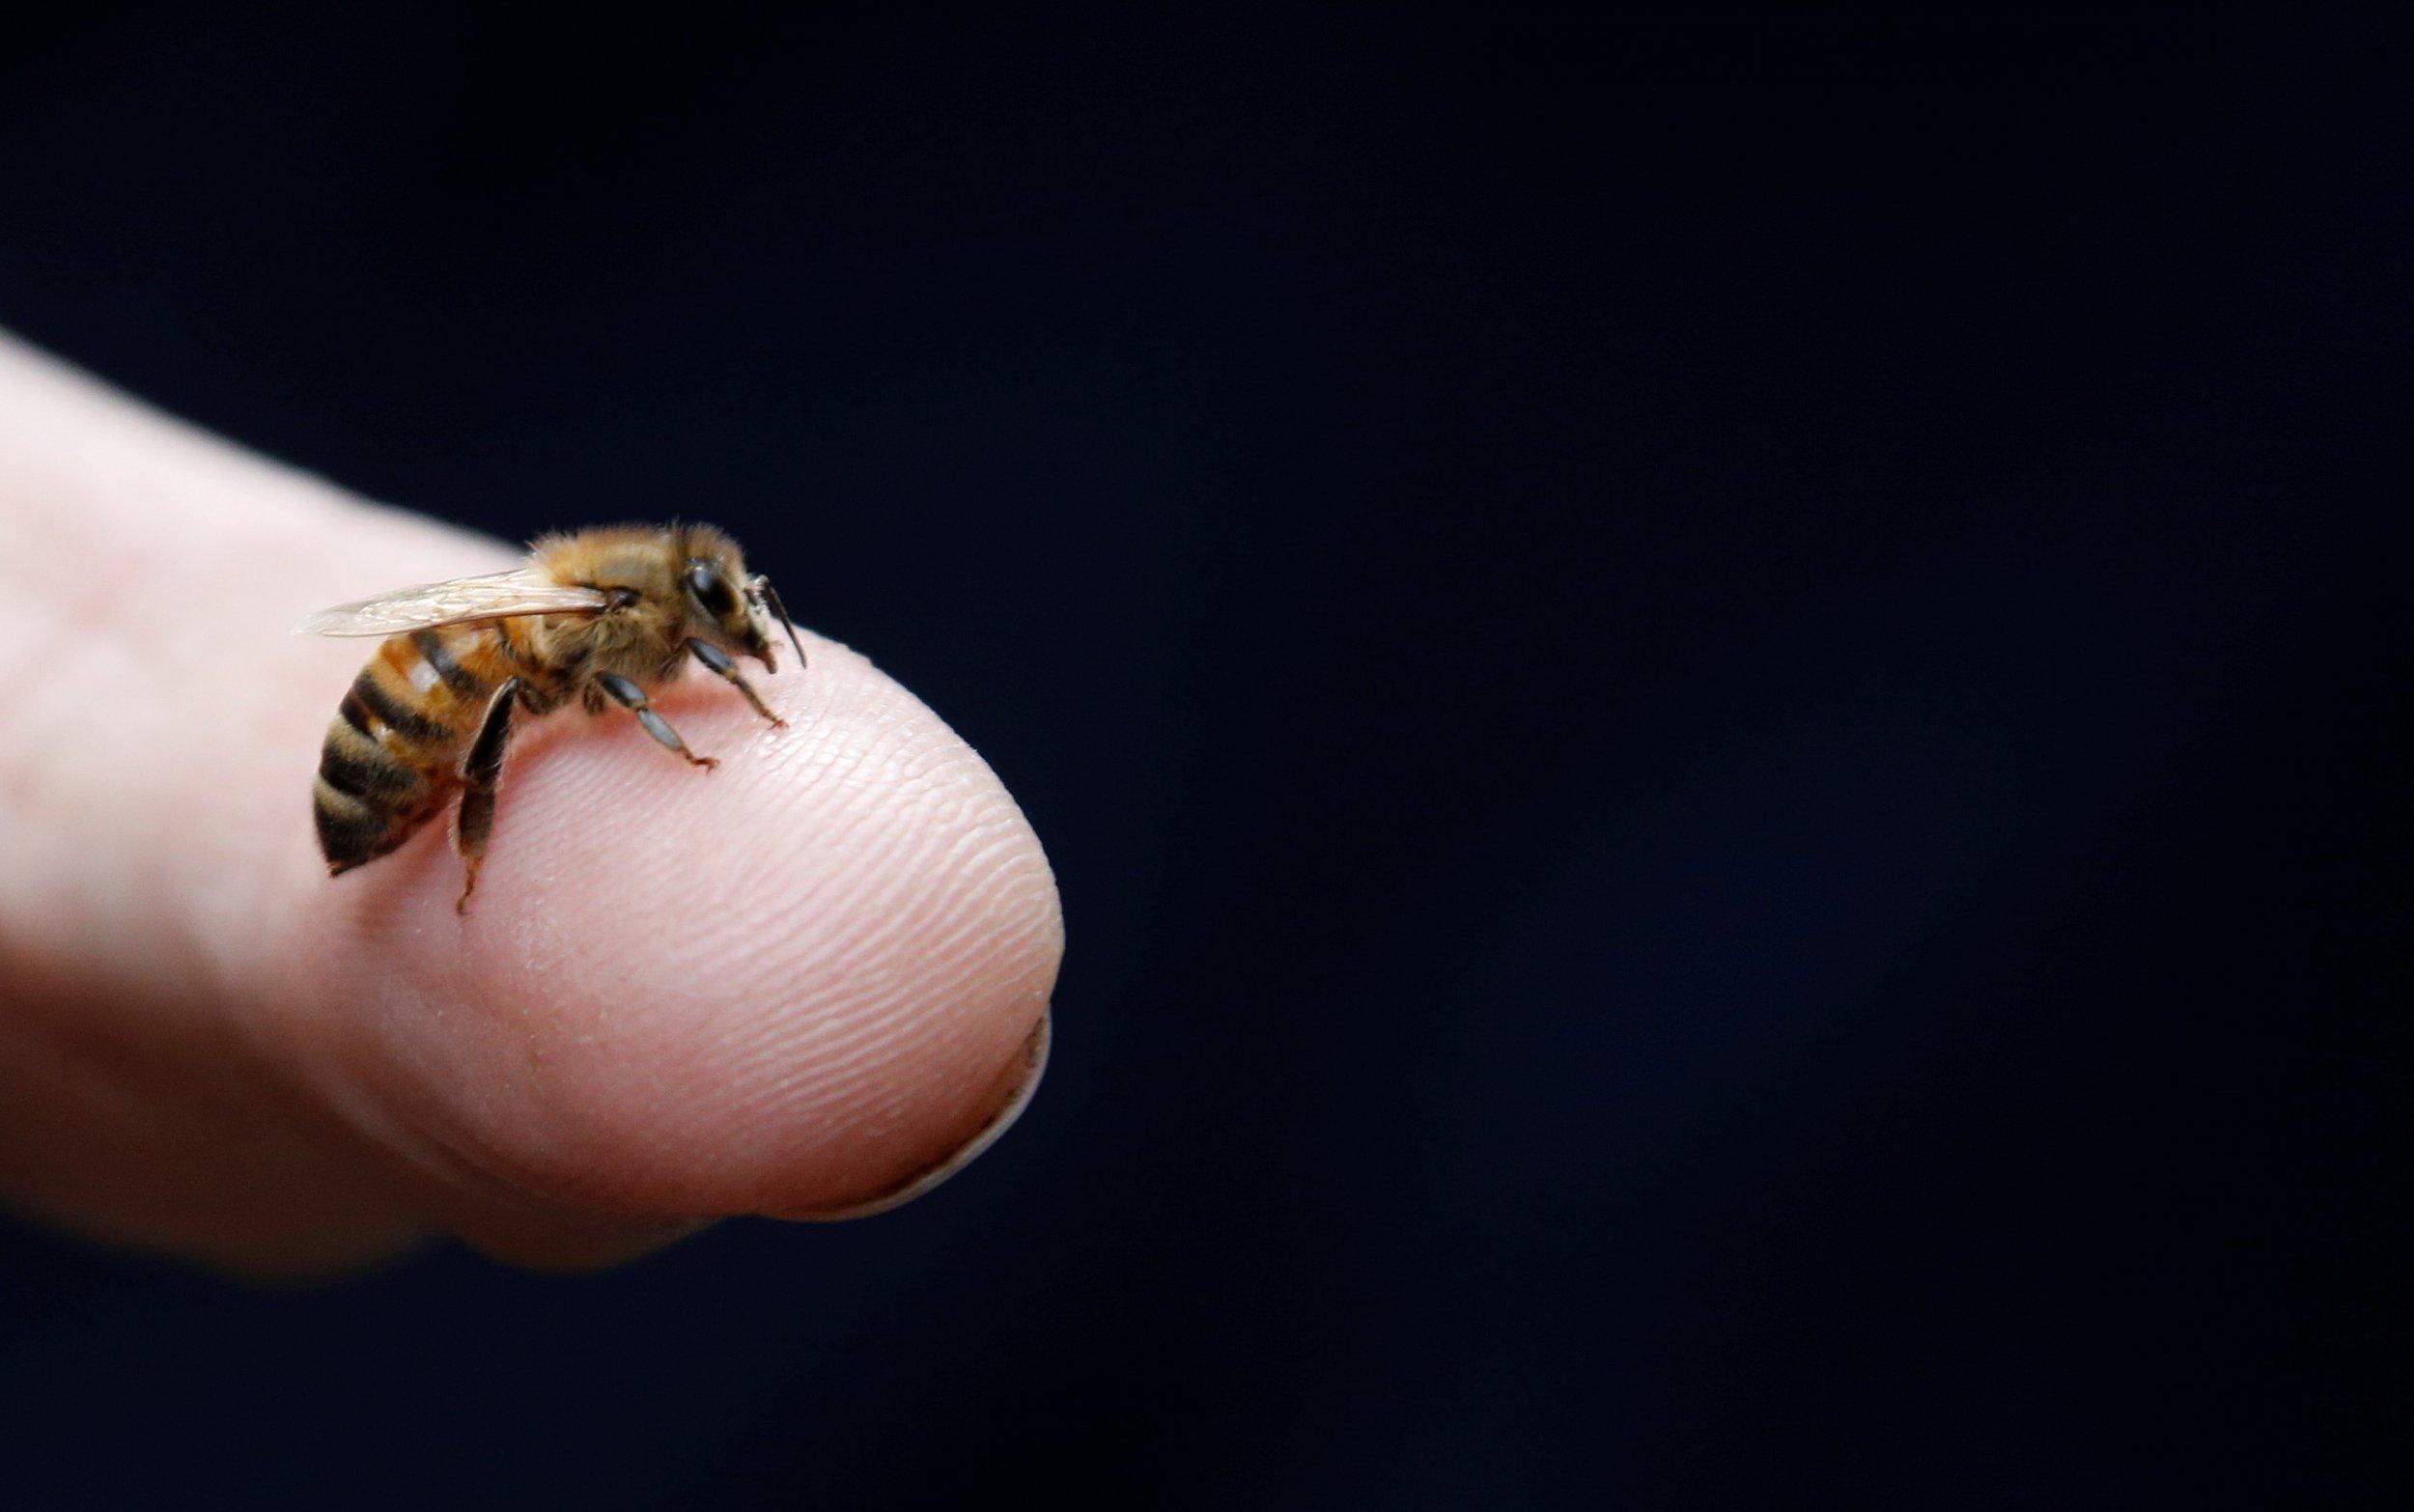 Honeybee sits on a finger